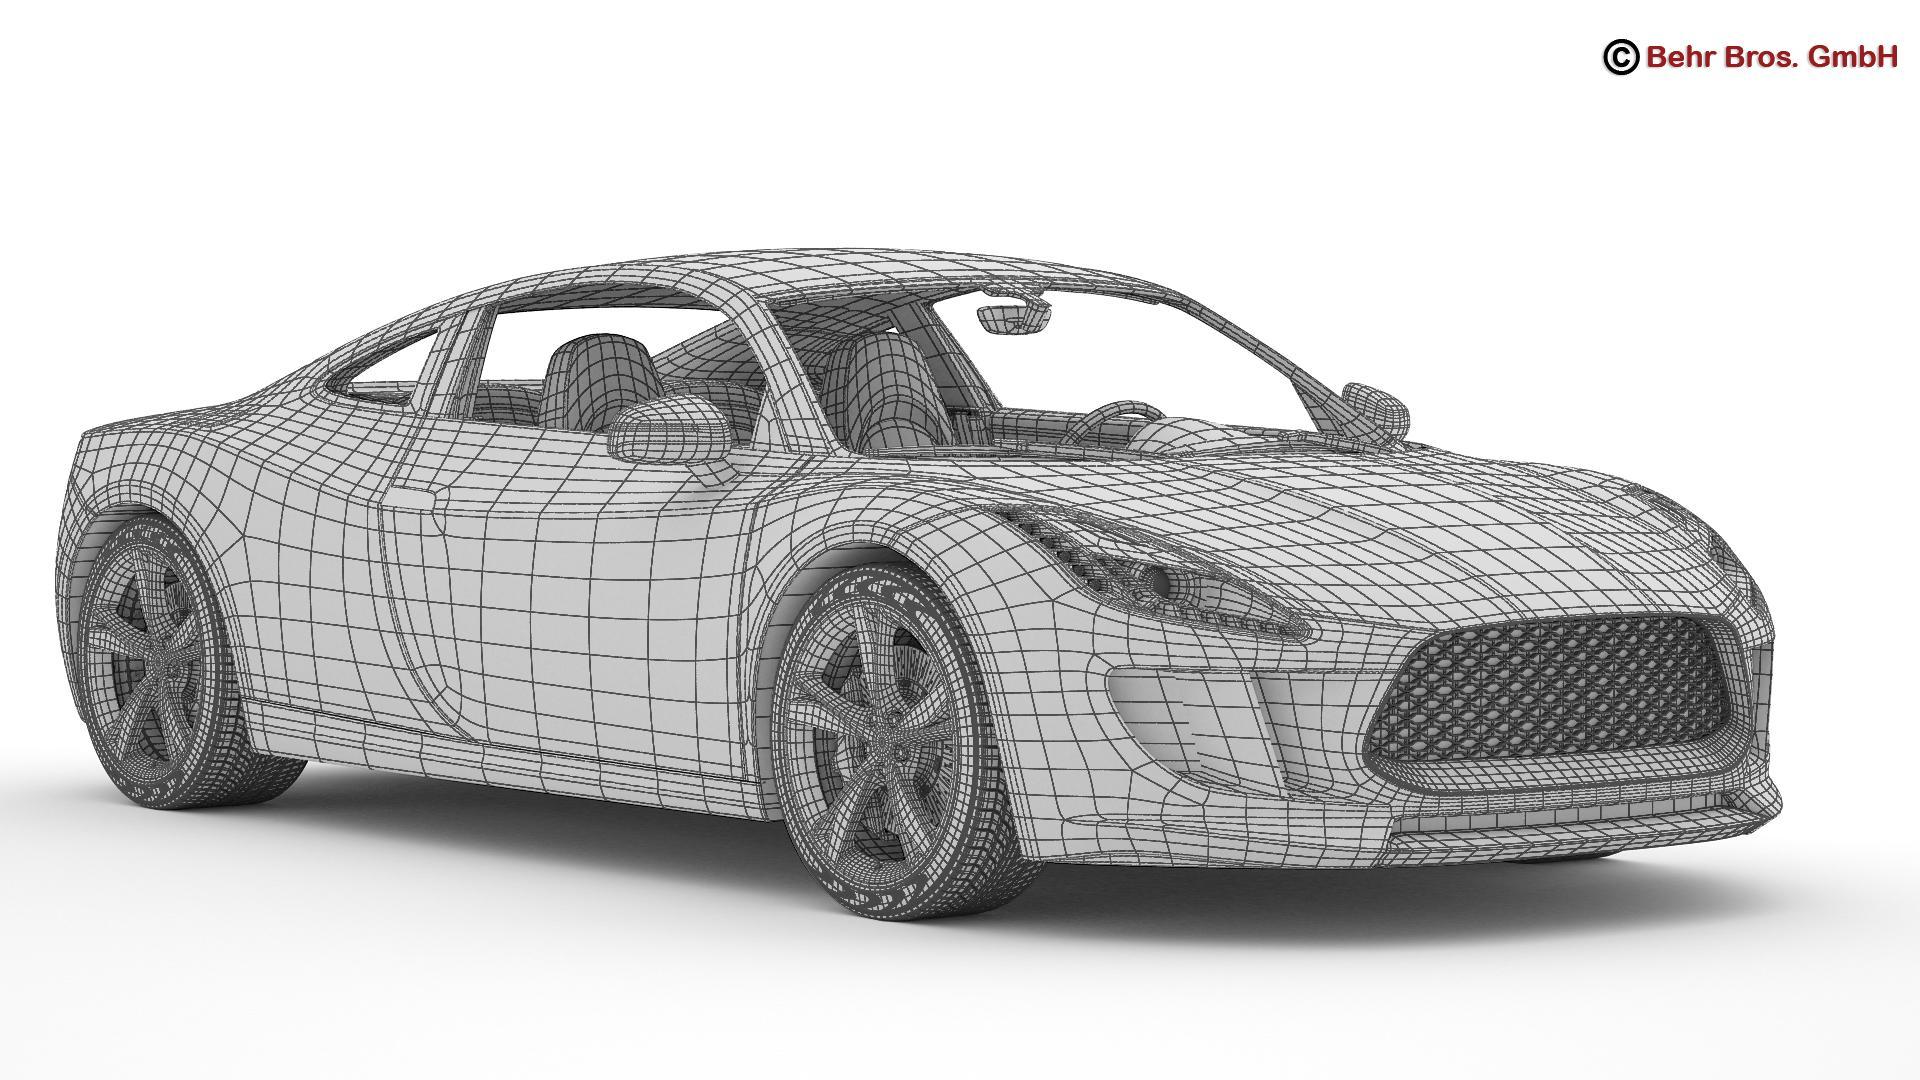 generic sports car 3d model 3ds max fbx c4d lwo ma mb obj 160535